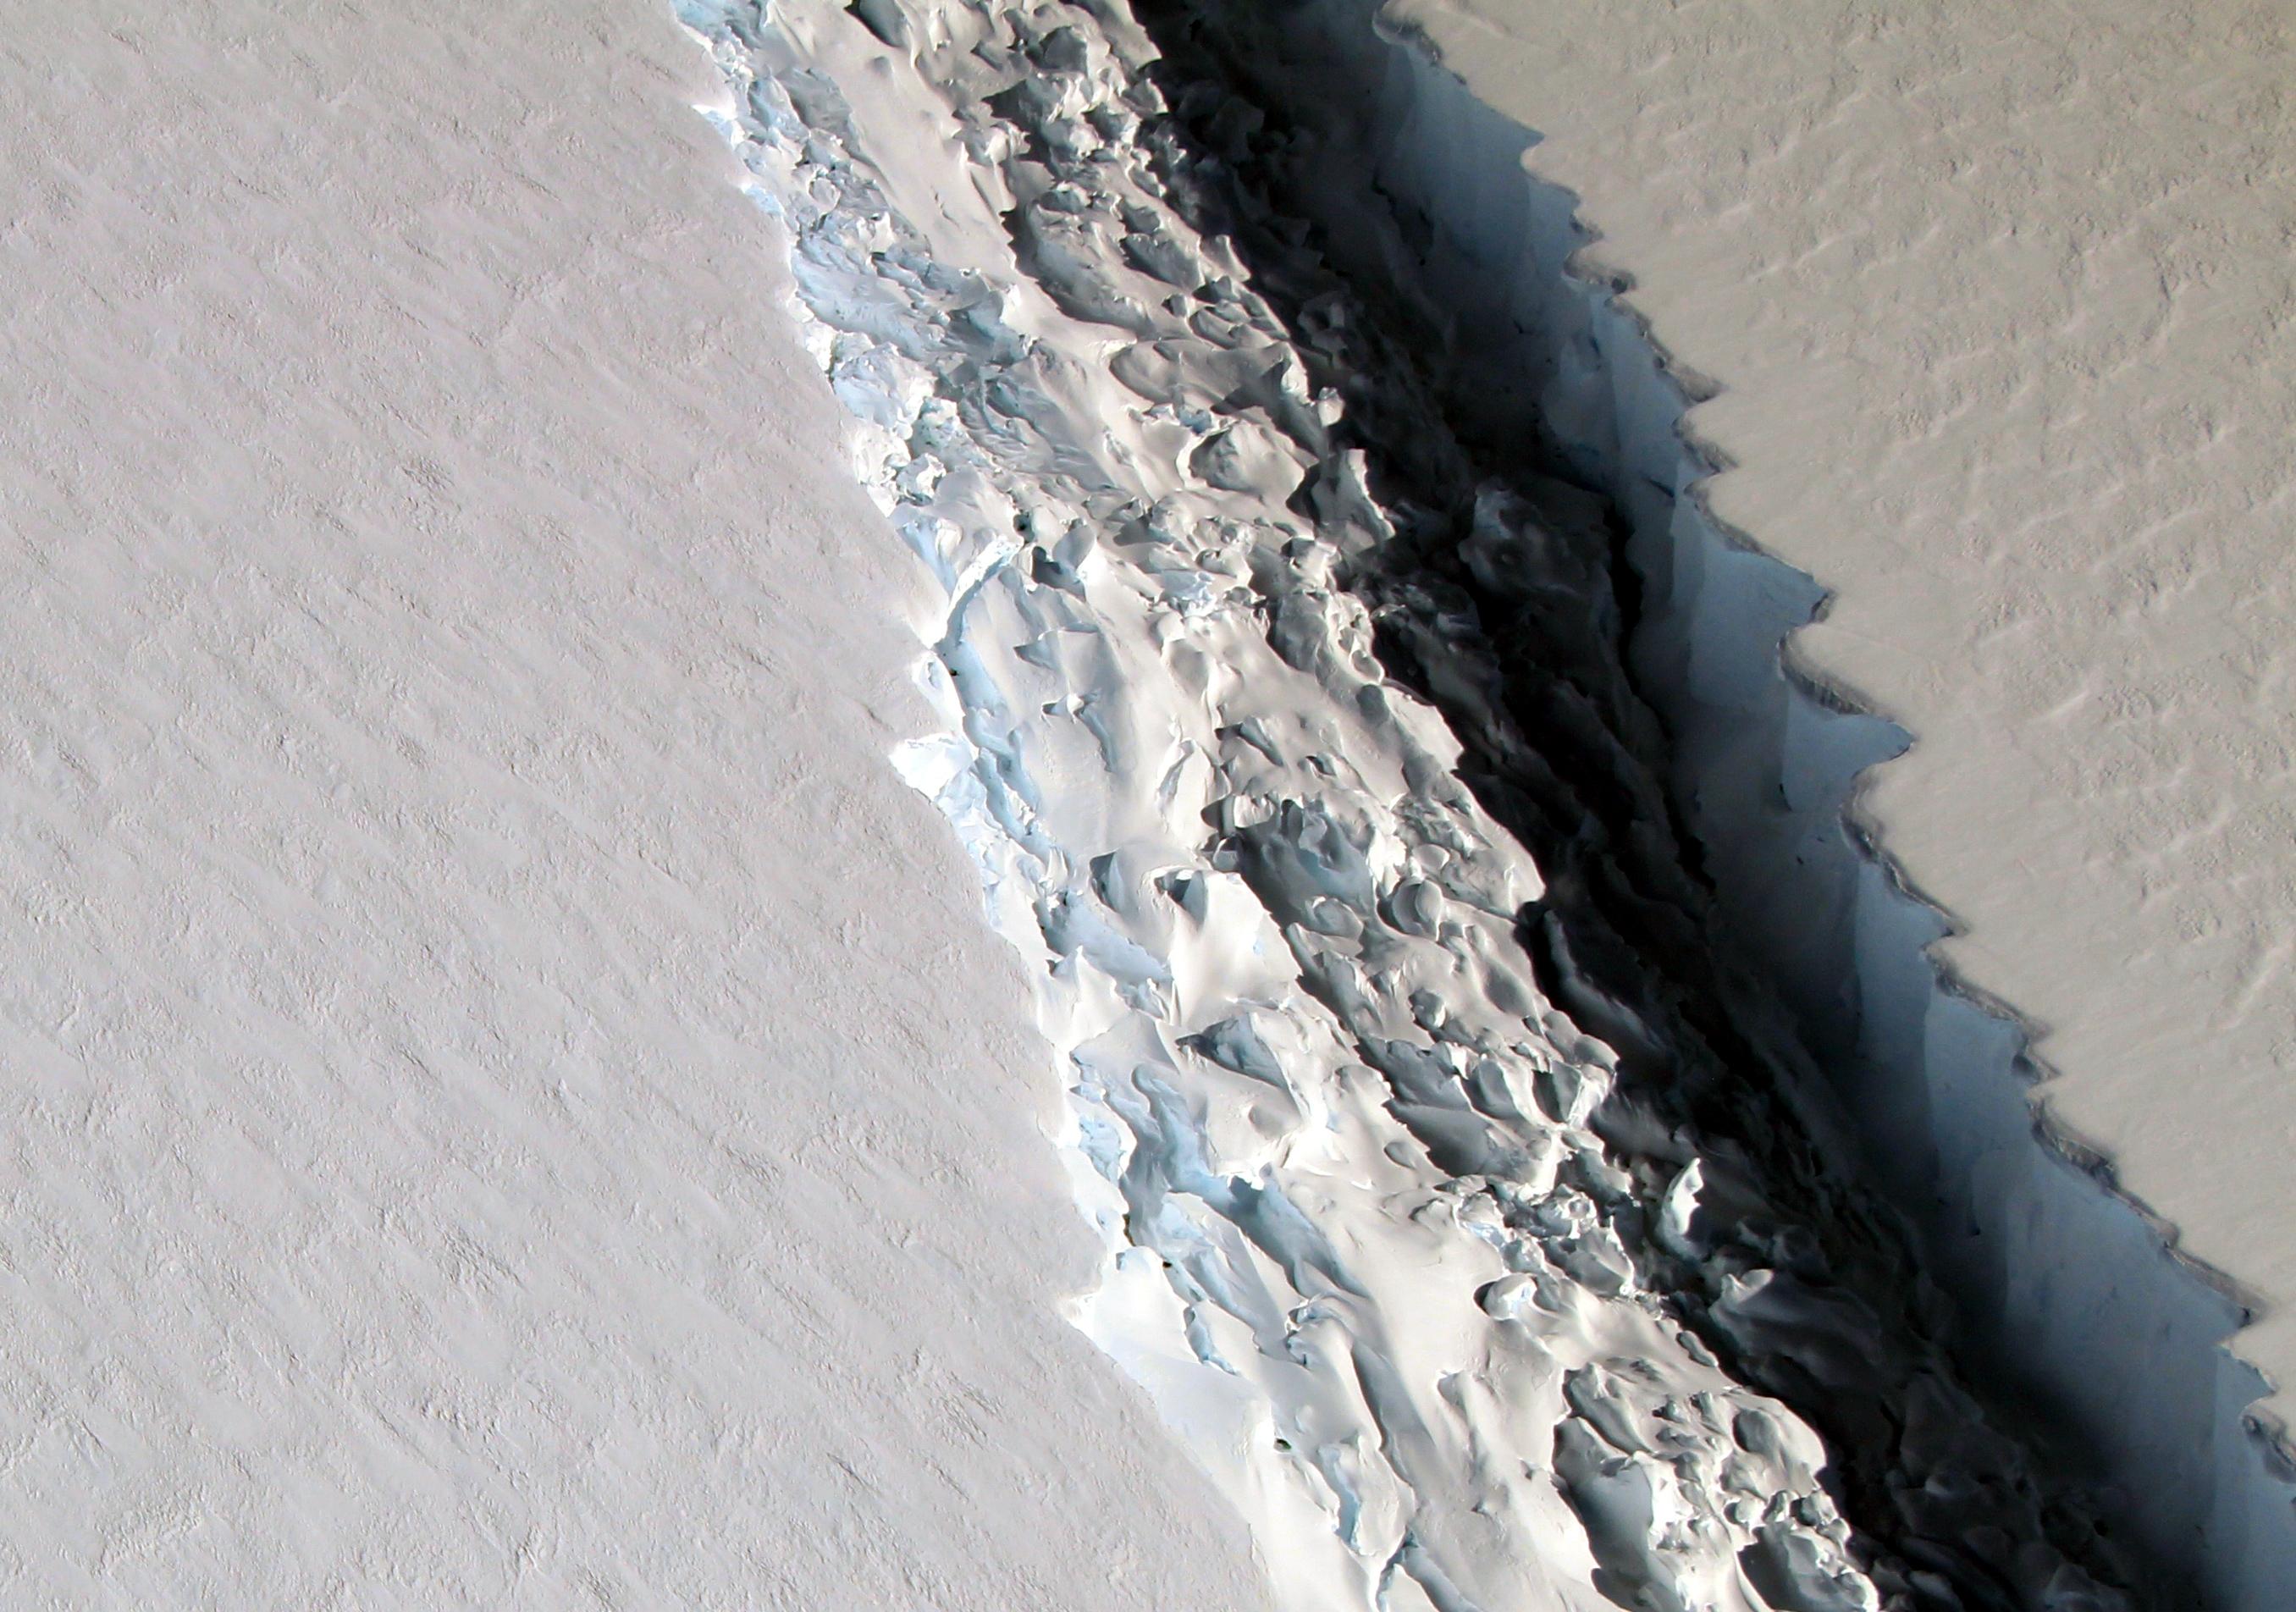 Spreading crack in Antarctic might create huge iceberg